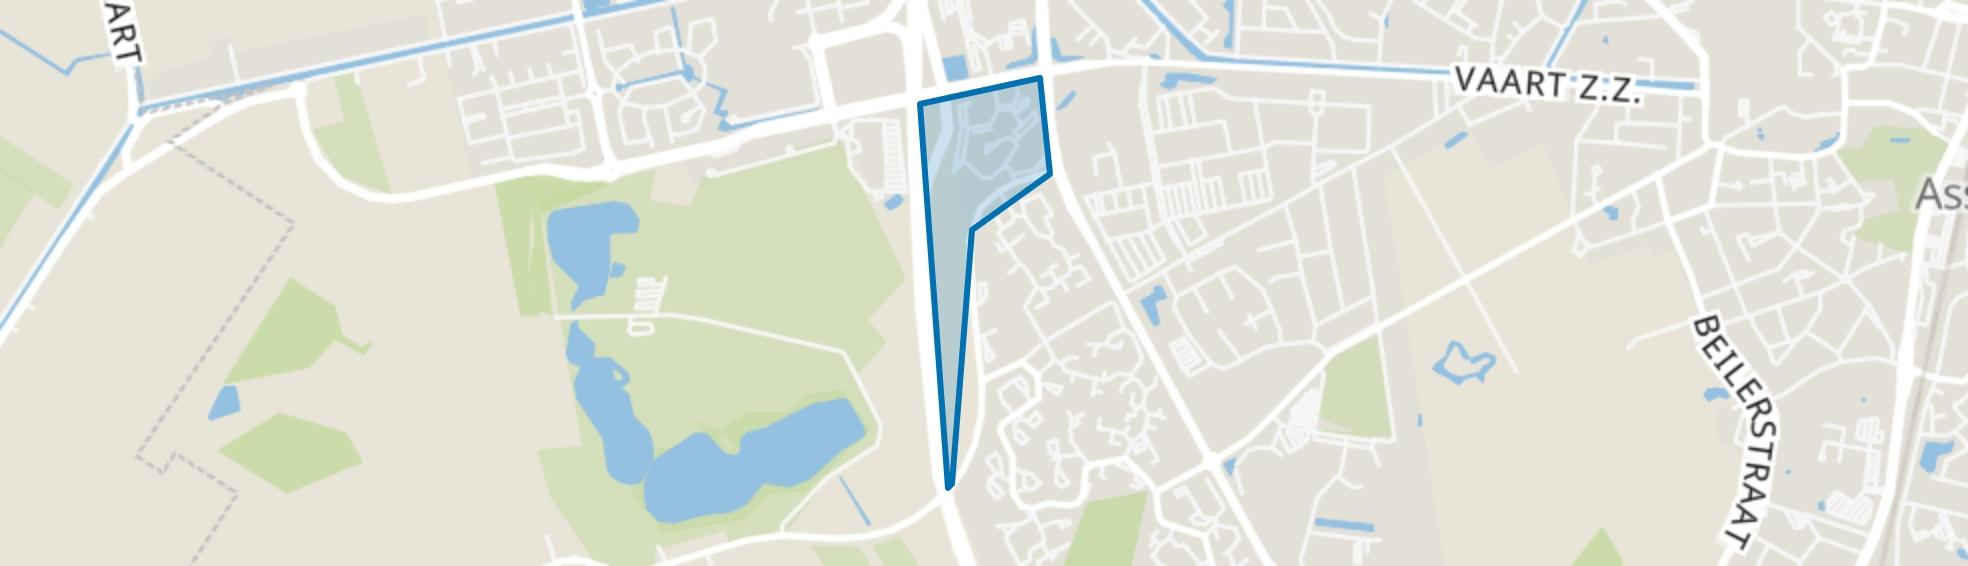 Lauwers, Assen map